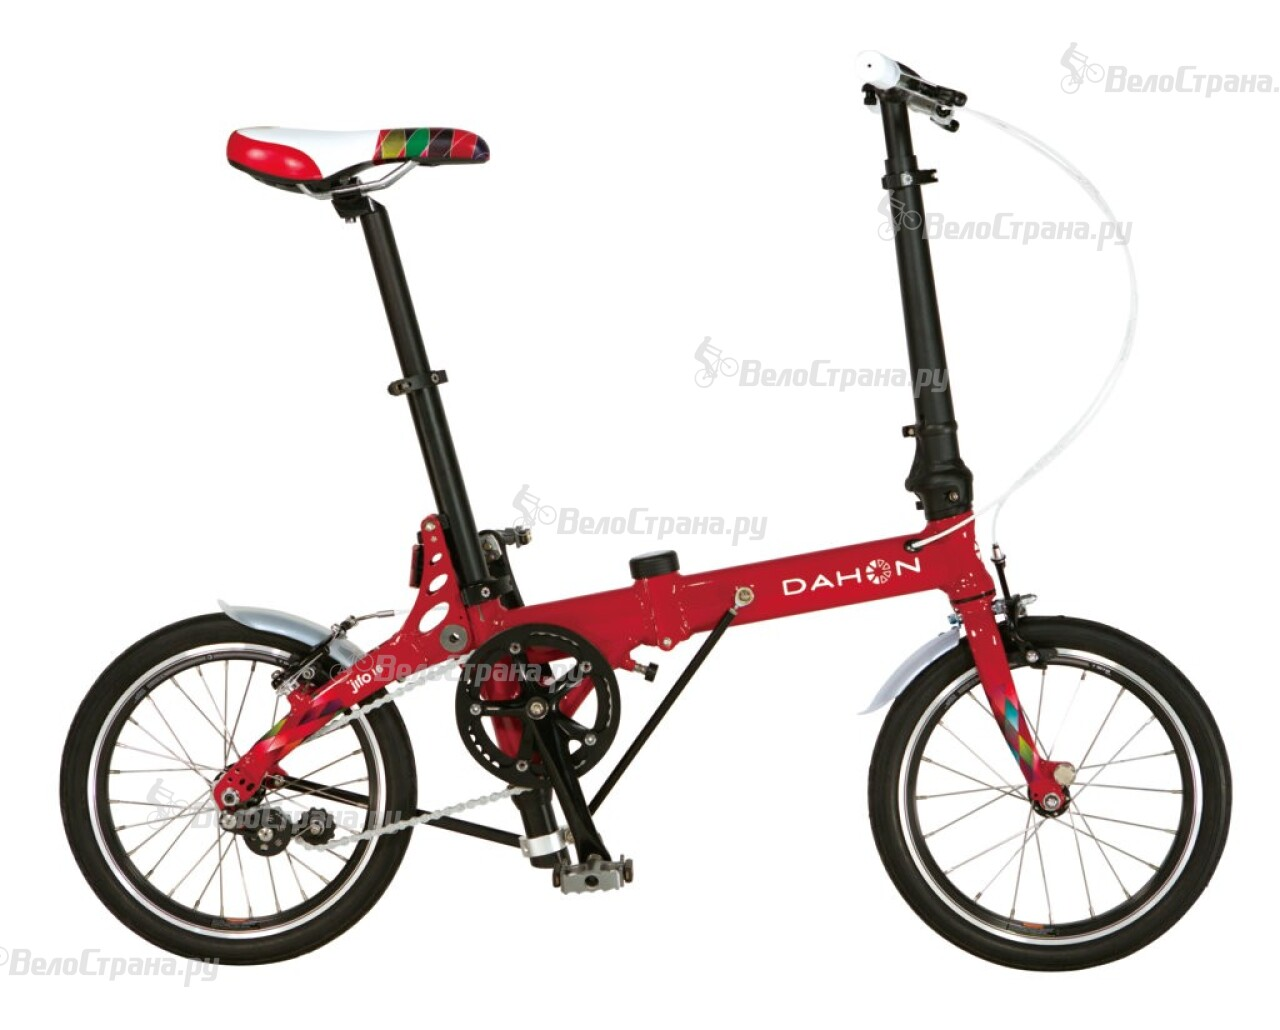 Велосипед Dahon Jifo (2014)